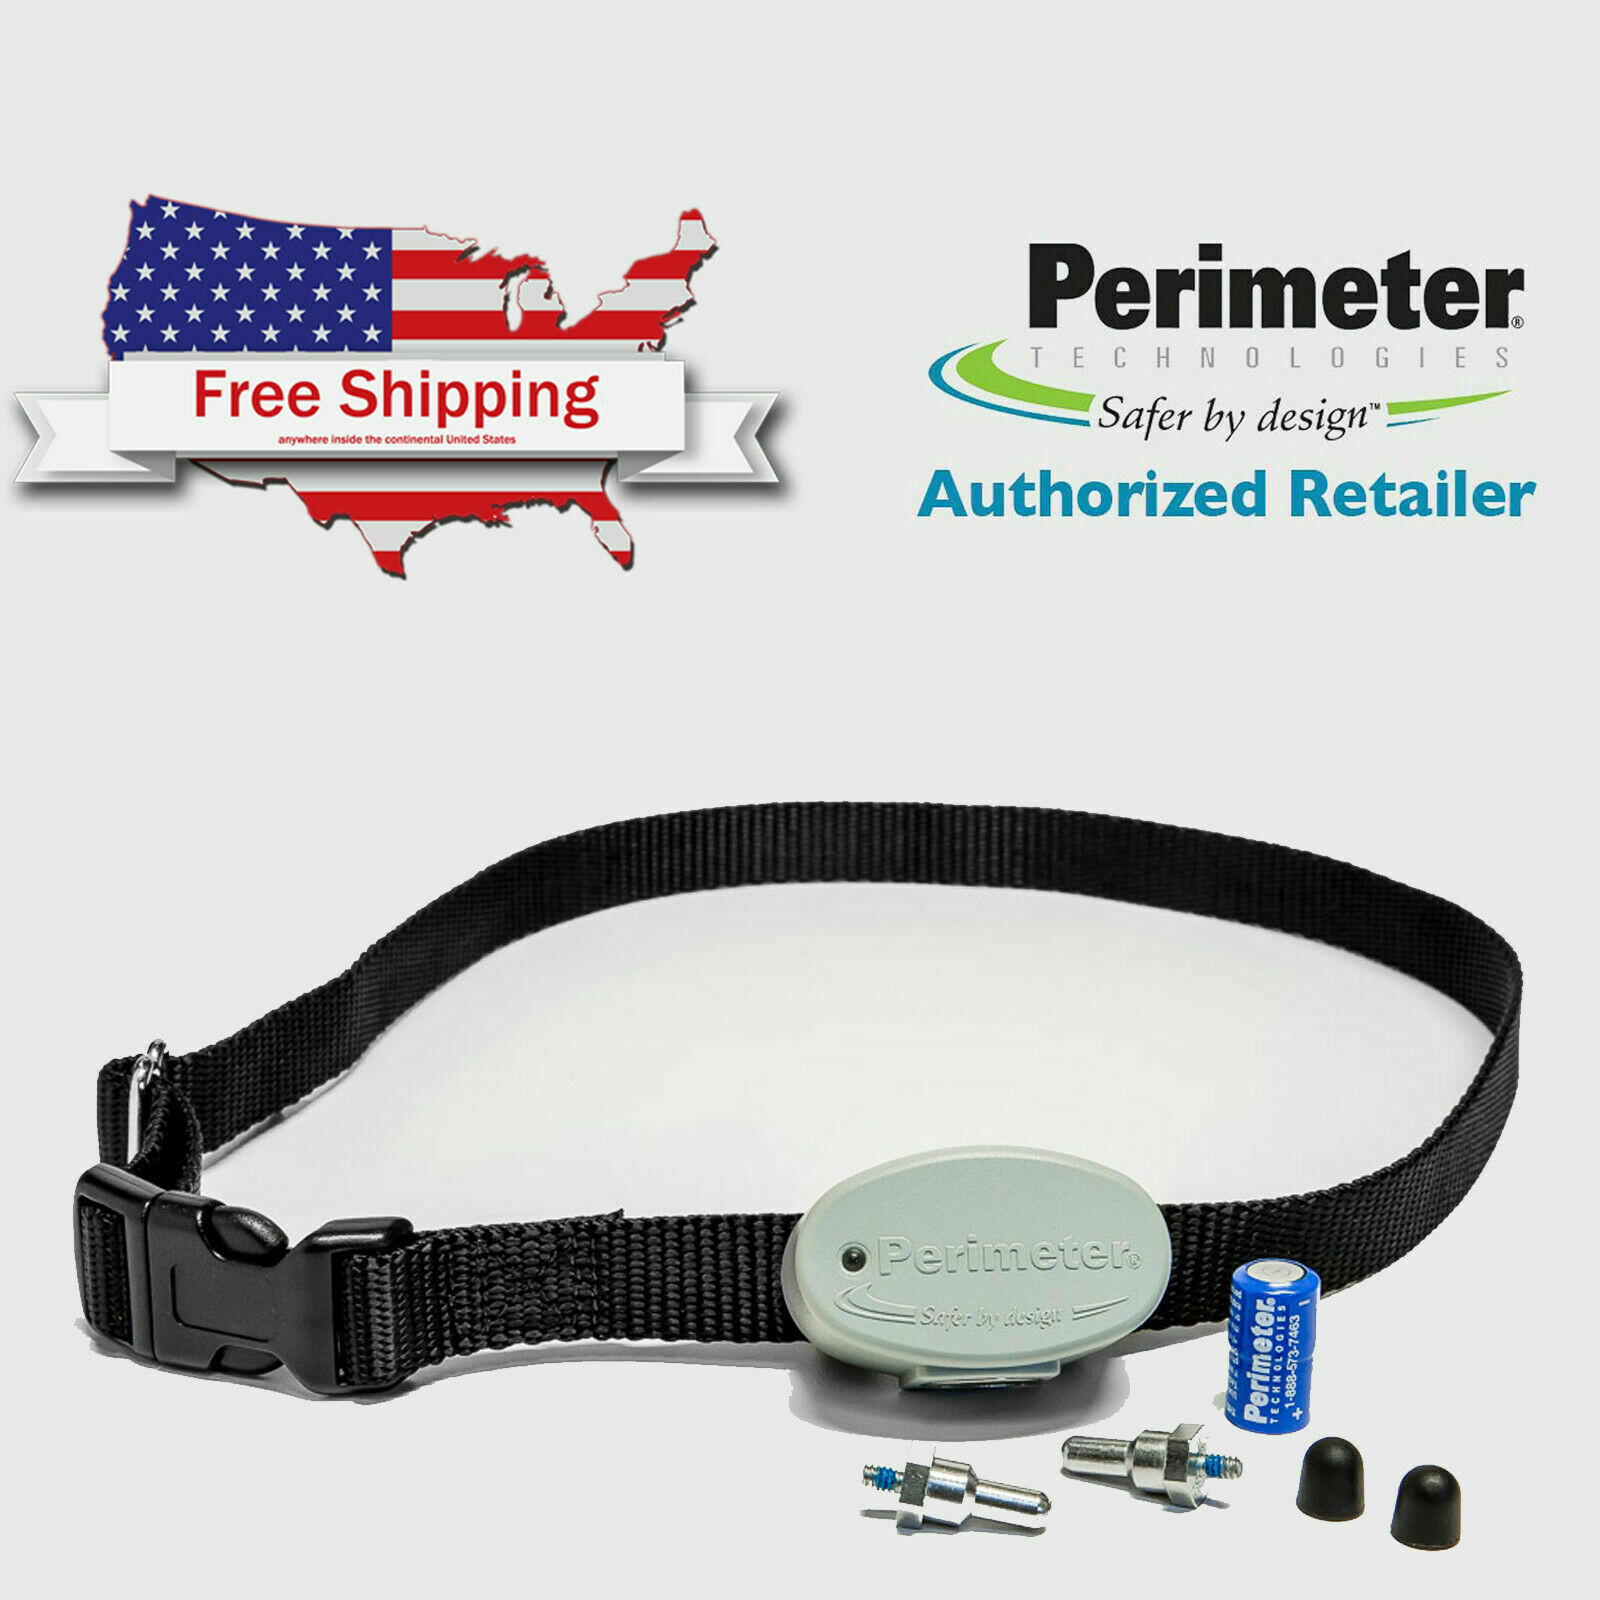 perimeter-r21-r51-invisible-fence-10k-compatible-dog-collar-receiver-ict-700-725